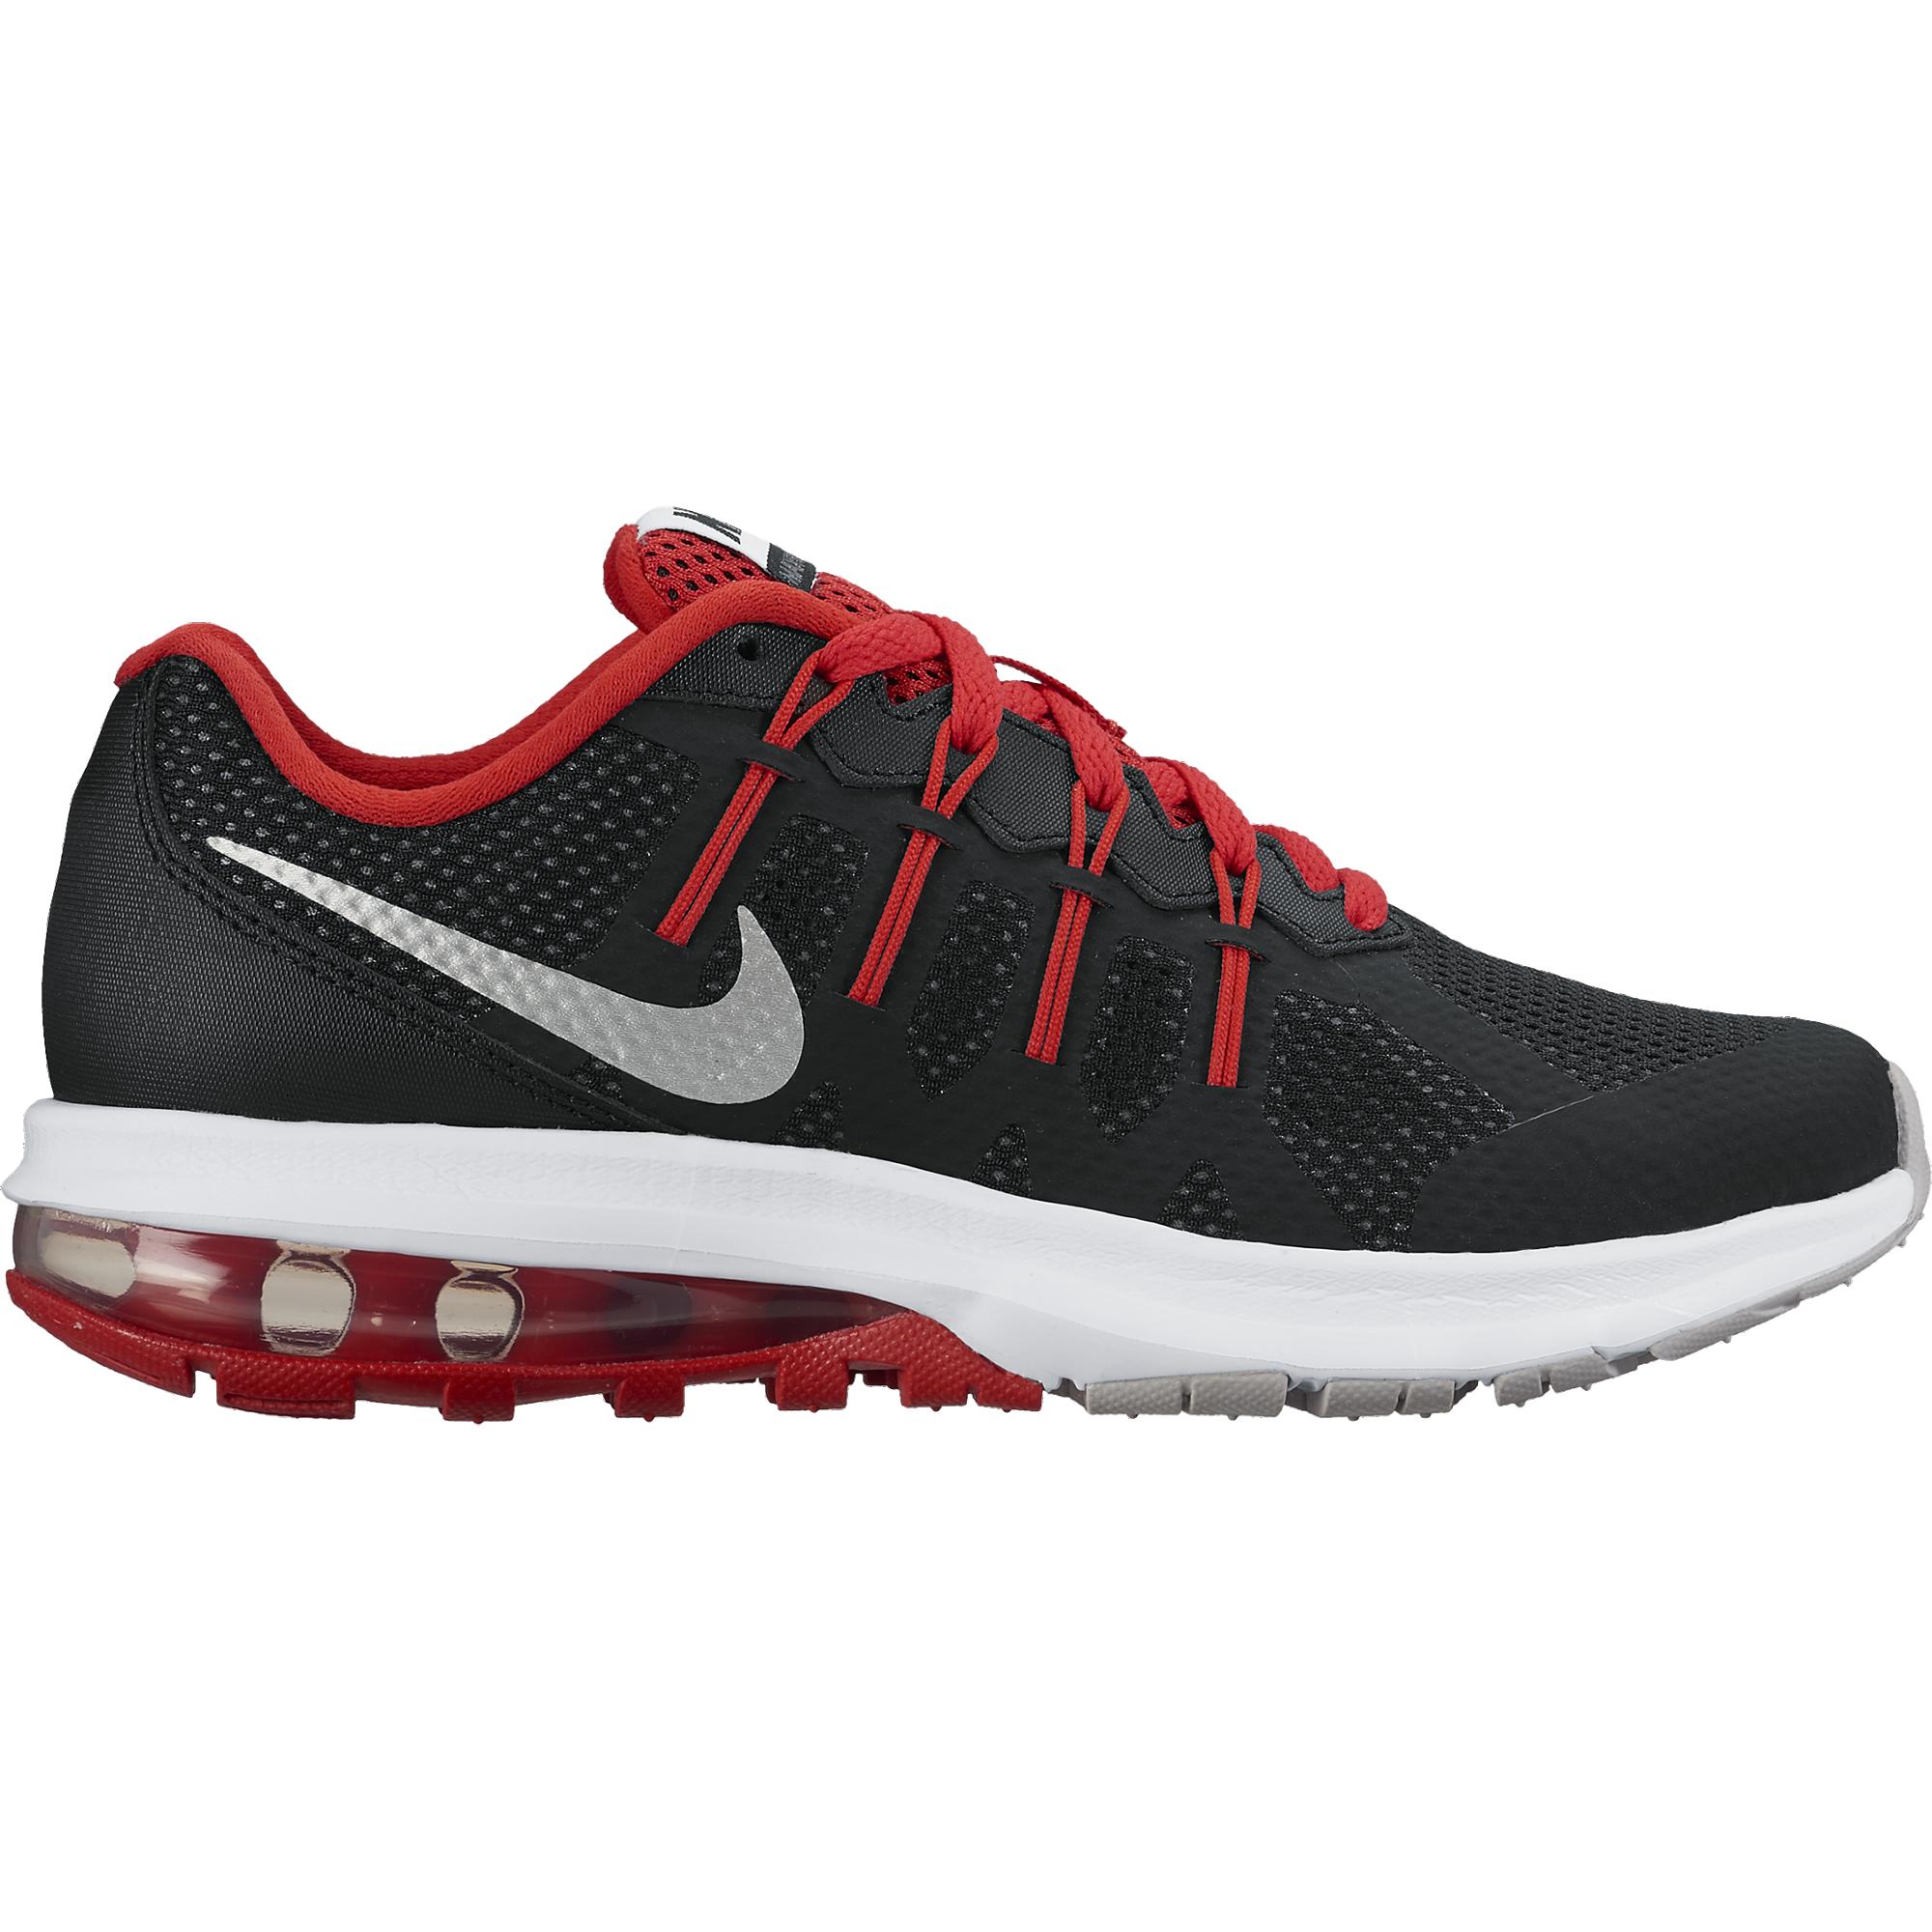 b04dc41789 Nike Boys Nike Air Max Dynasty 820268-002 Gyerek Utcai Cipő | Utcai cipő